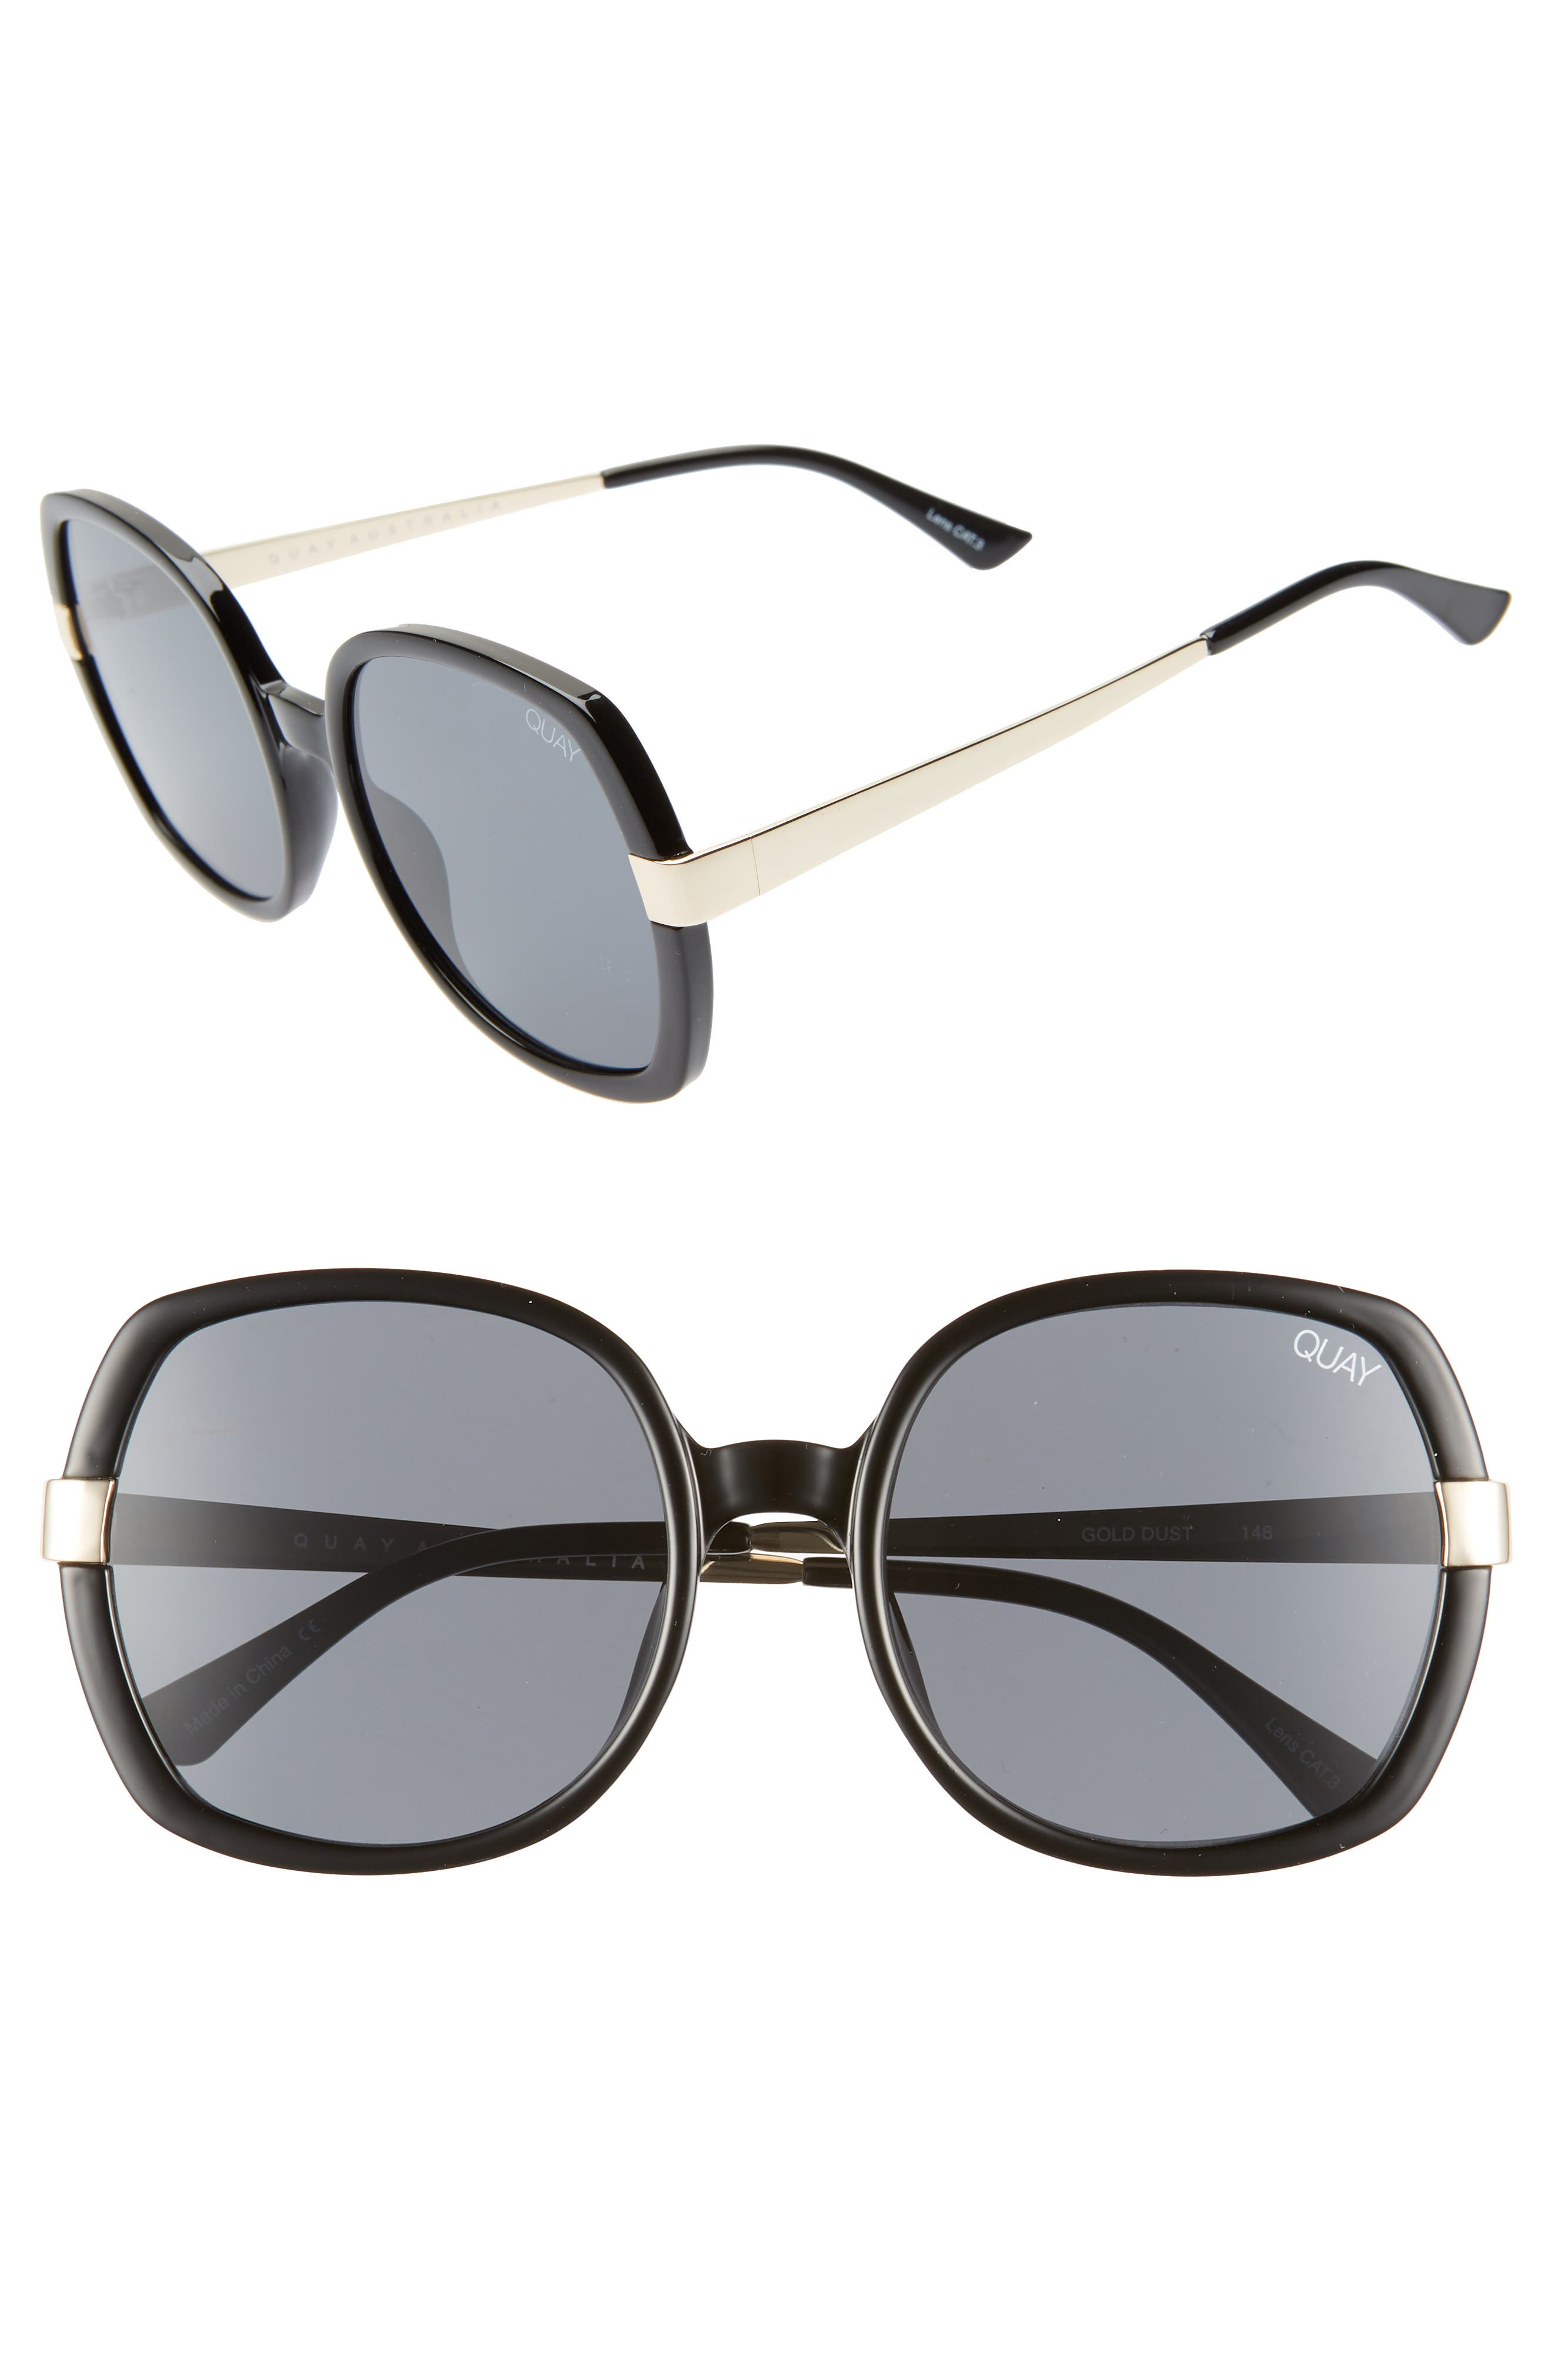 Quay Australia Gold Dust 55Mm Square Sunglasses - Black / Smoke